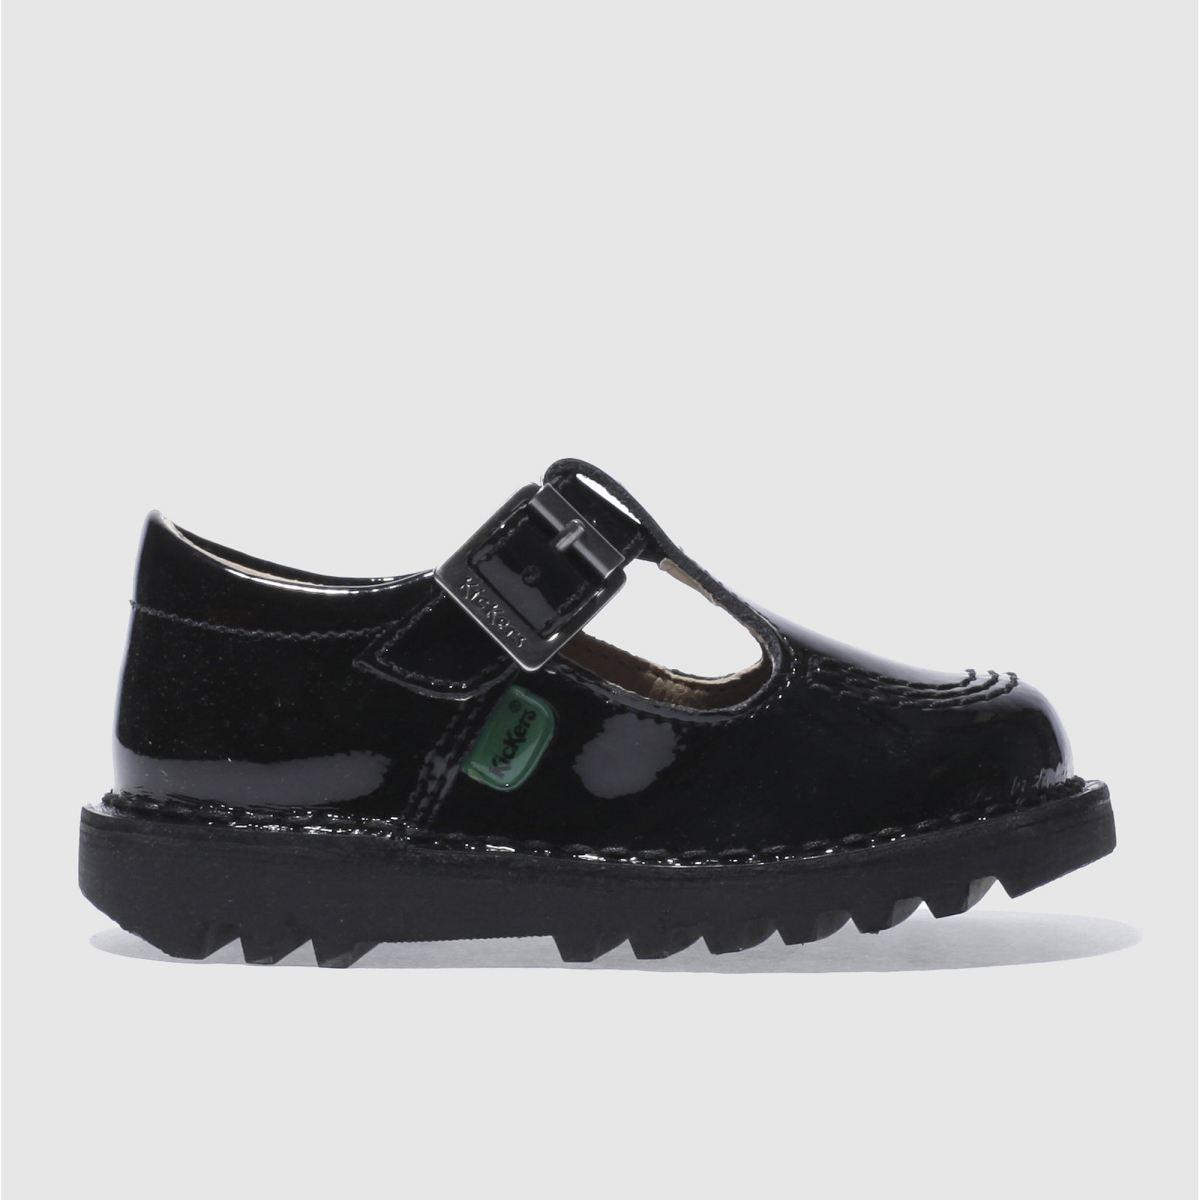 Kickers Black Kick T-bar Shoes Toddler